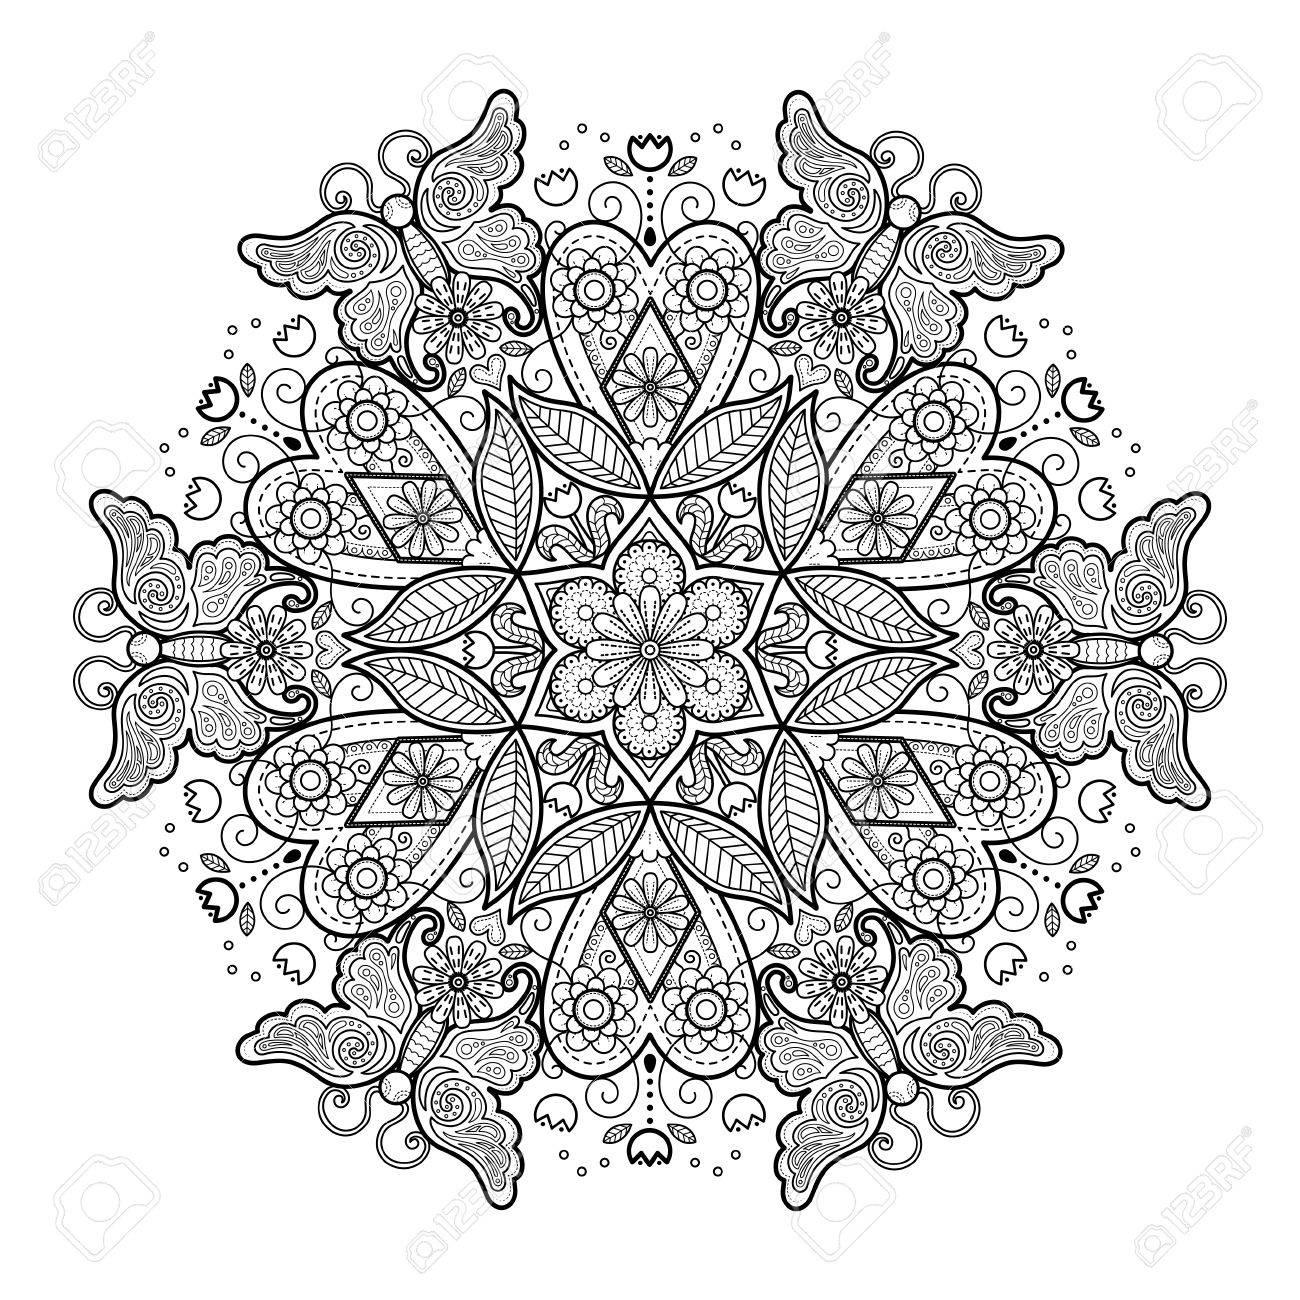 Hermosa Hermoso Diseño Para Colorear Viñeta - Ideas Para Colorear ...